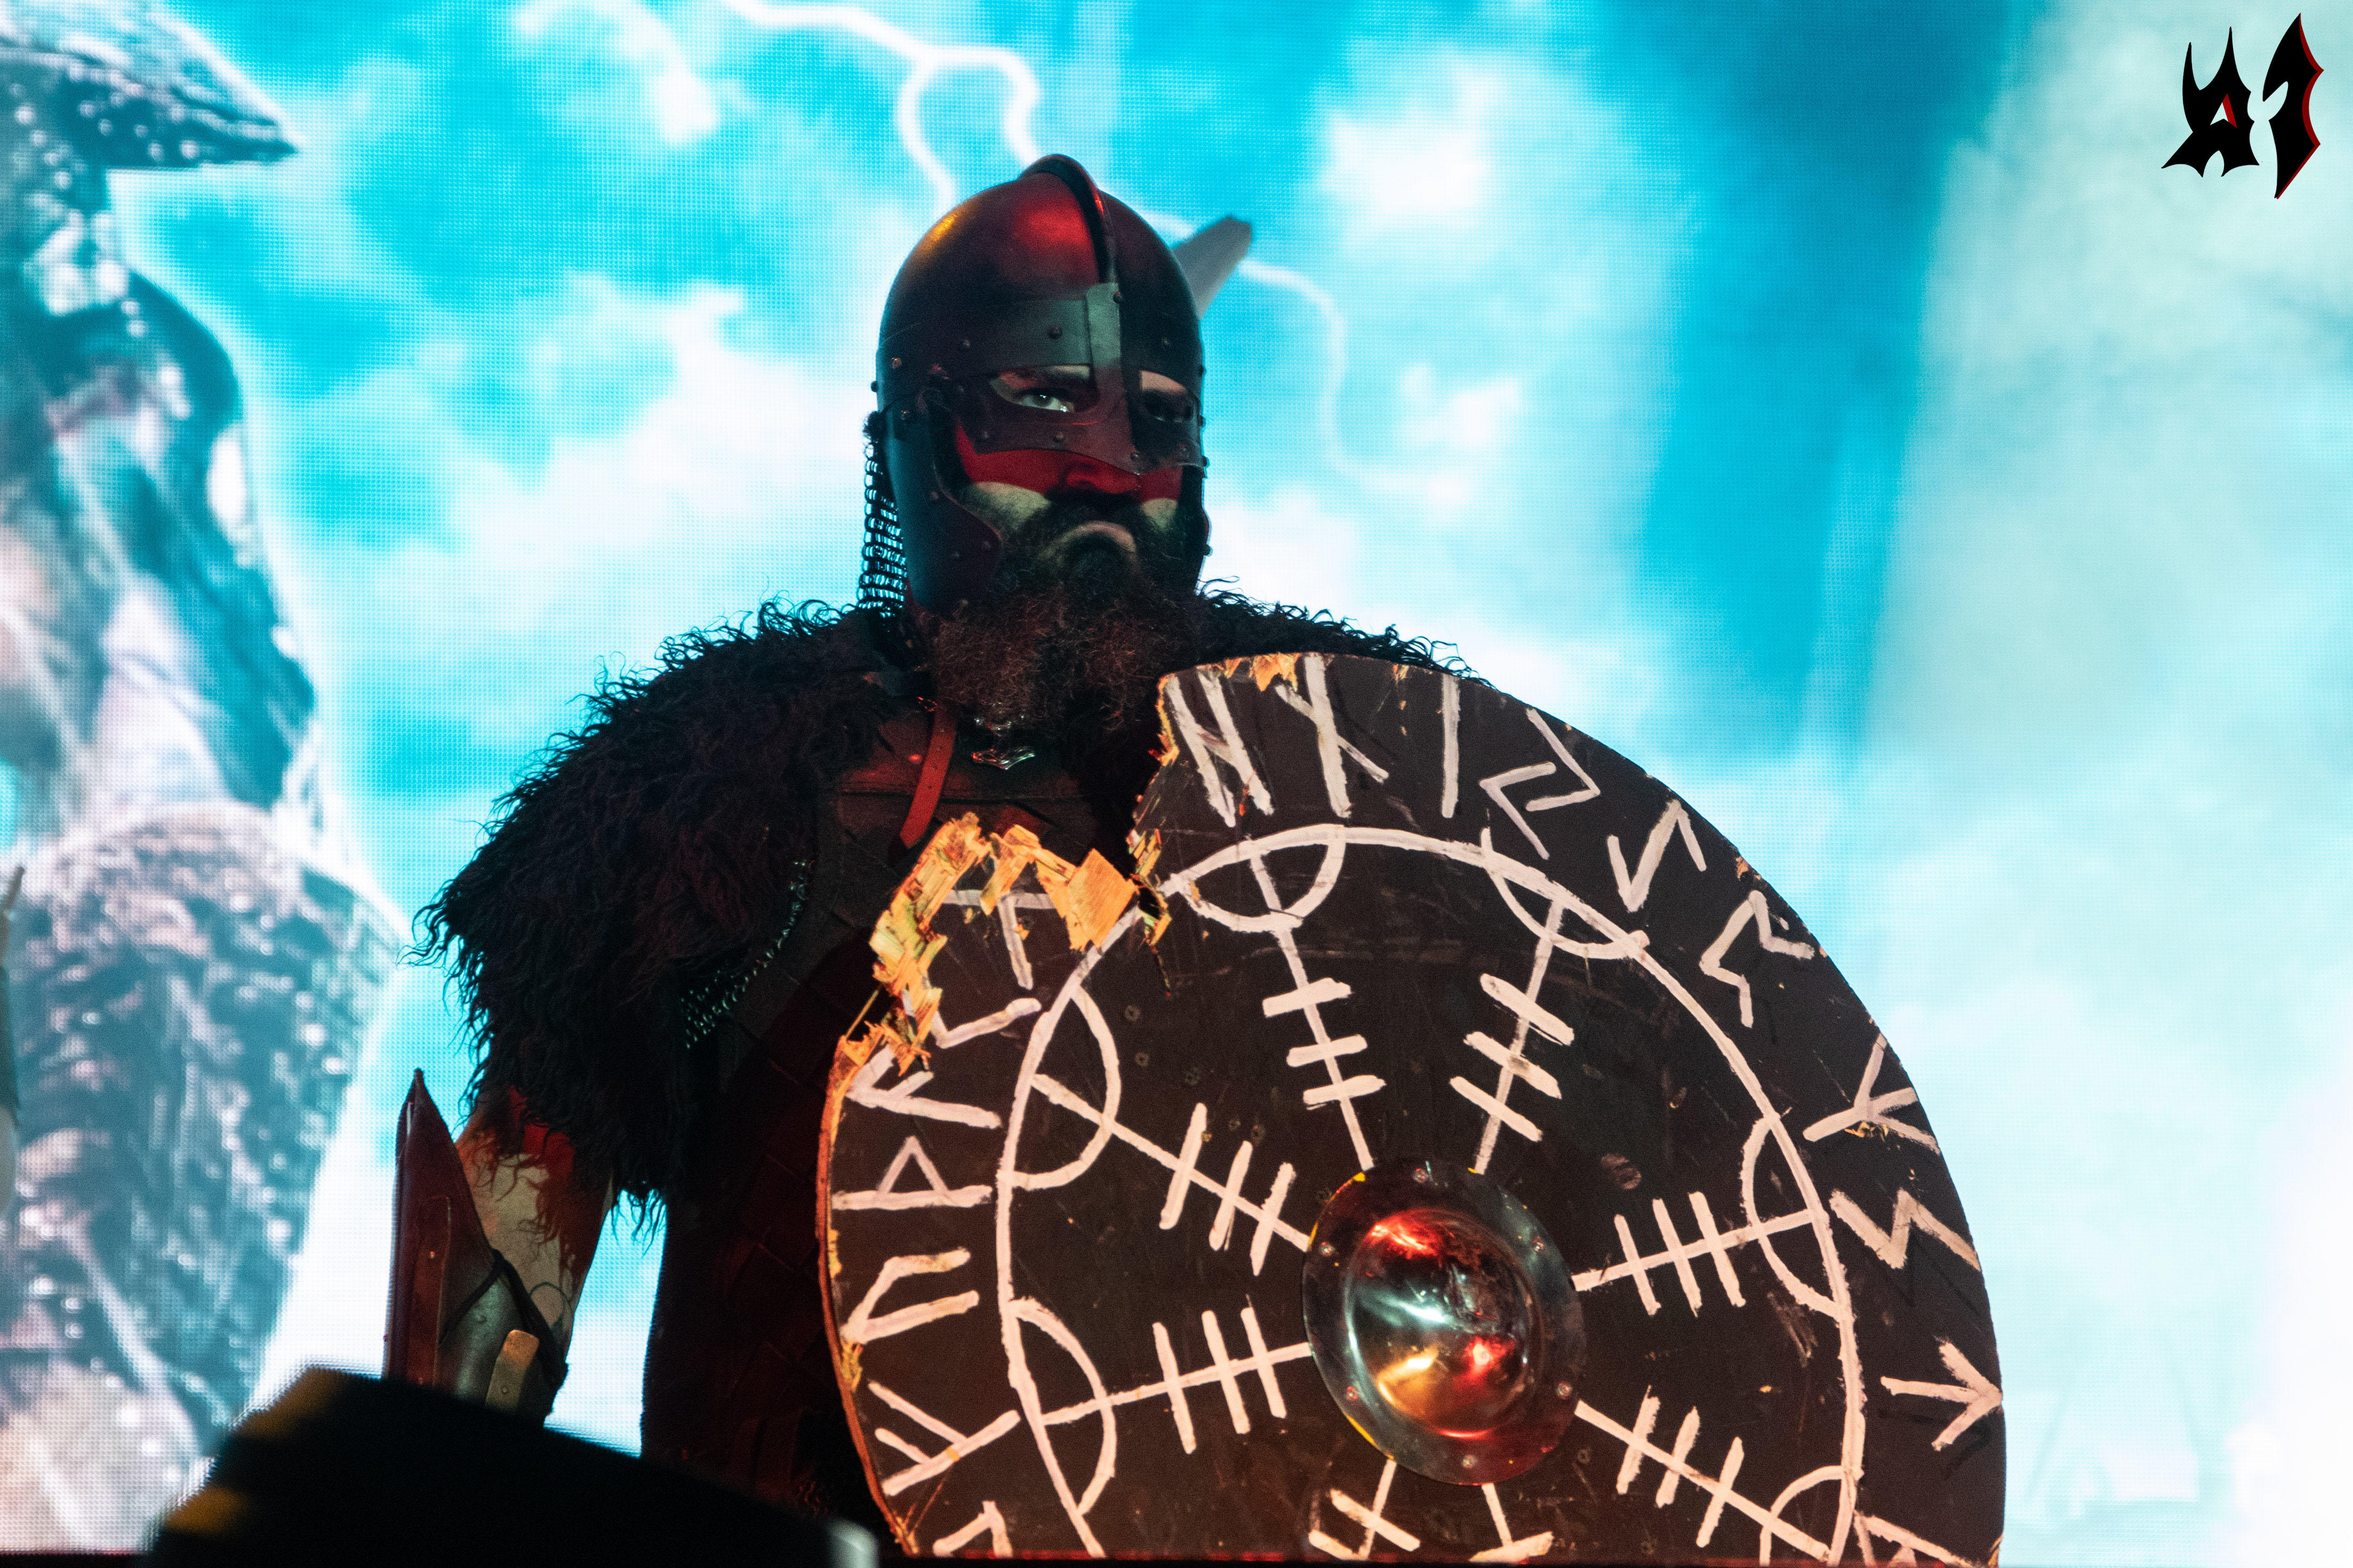 Knotfest - Amon Amarth - 26